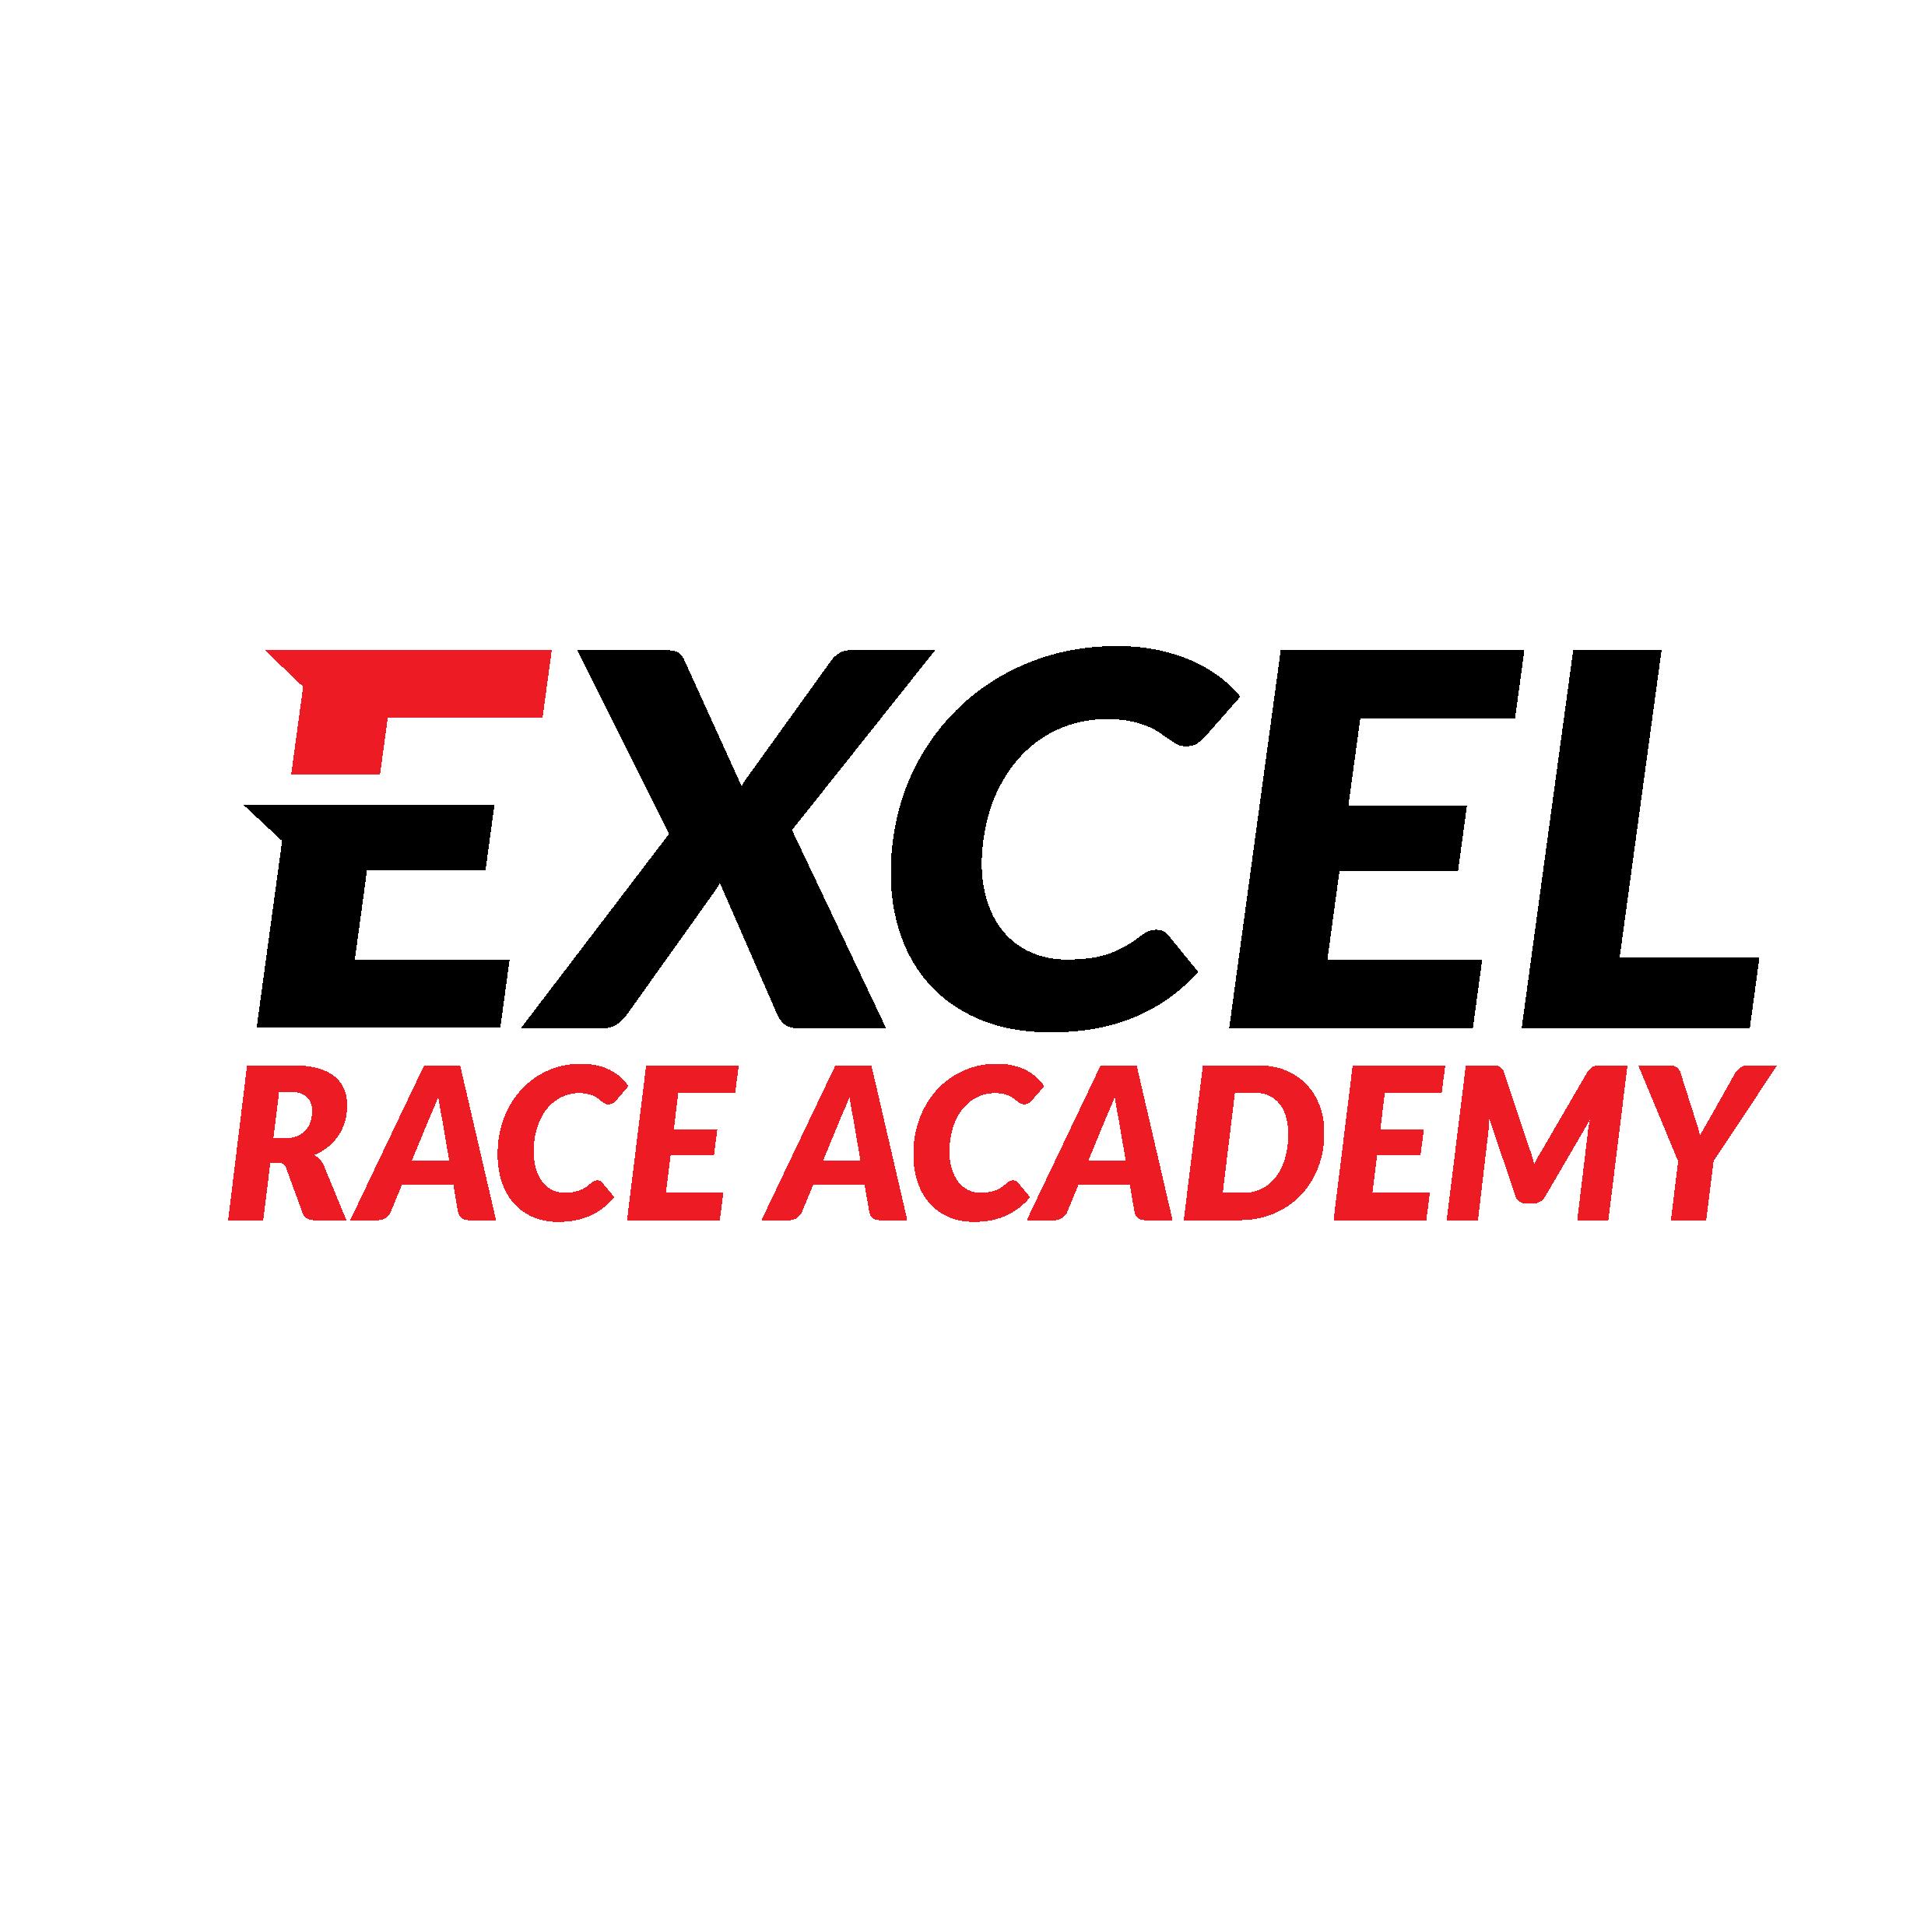 Excel Race Academy Logo